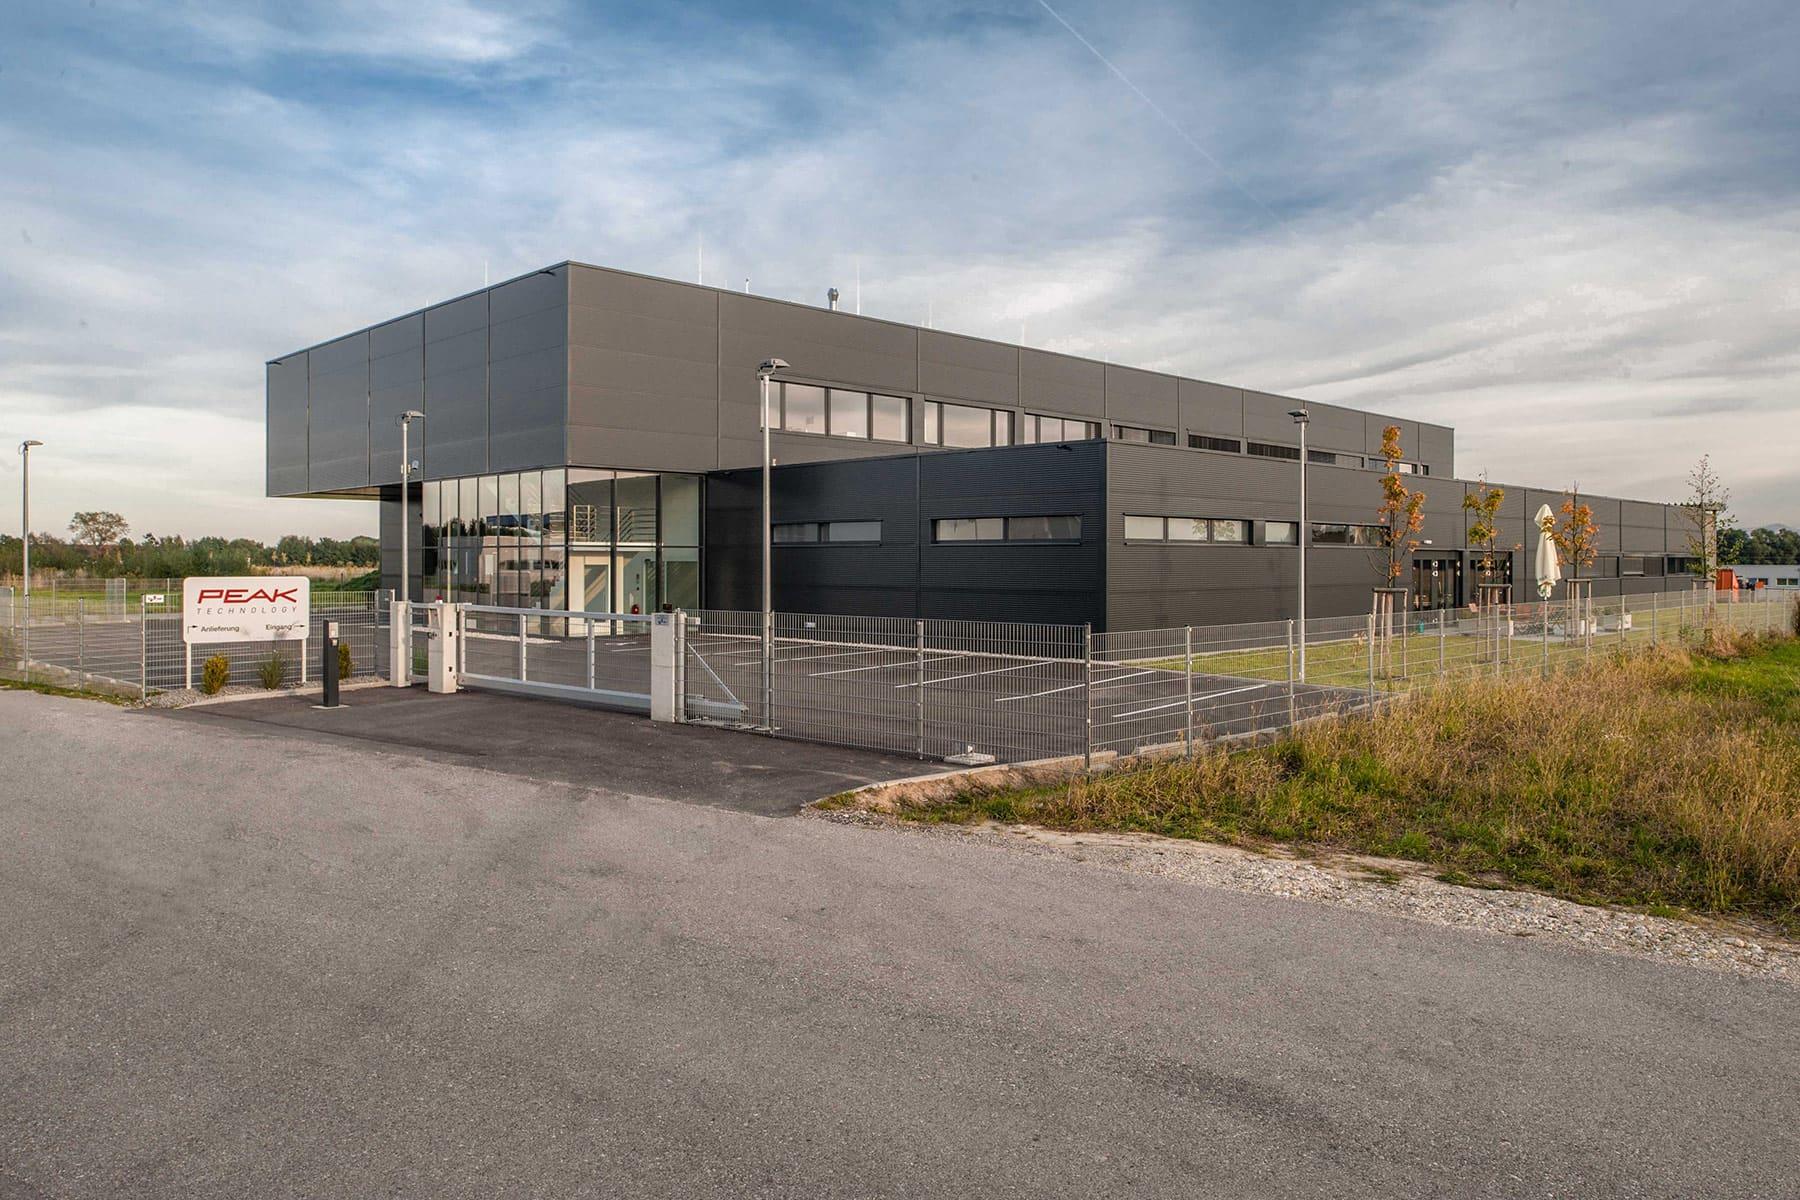 Fassade, Neubau, Firma, Architektur, Produktionsbetrieb, Peaktechnology, Holzhausen, Carbon, Kohlefaser